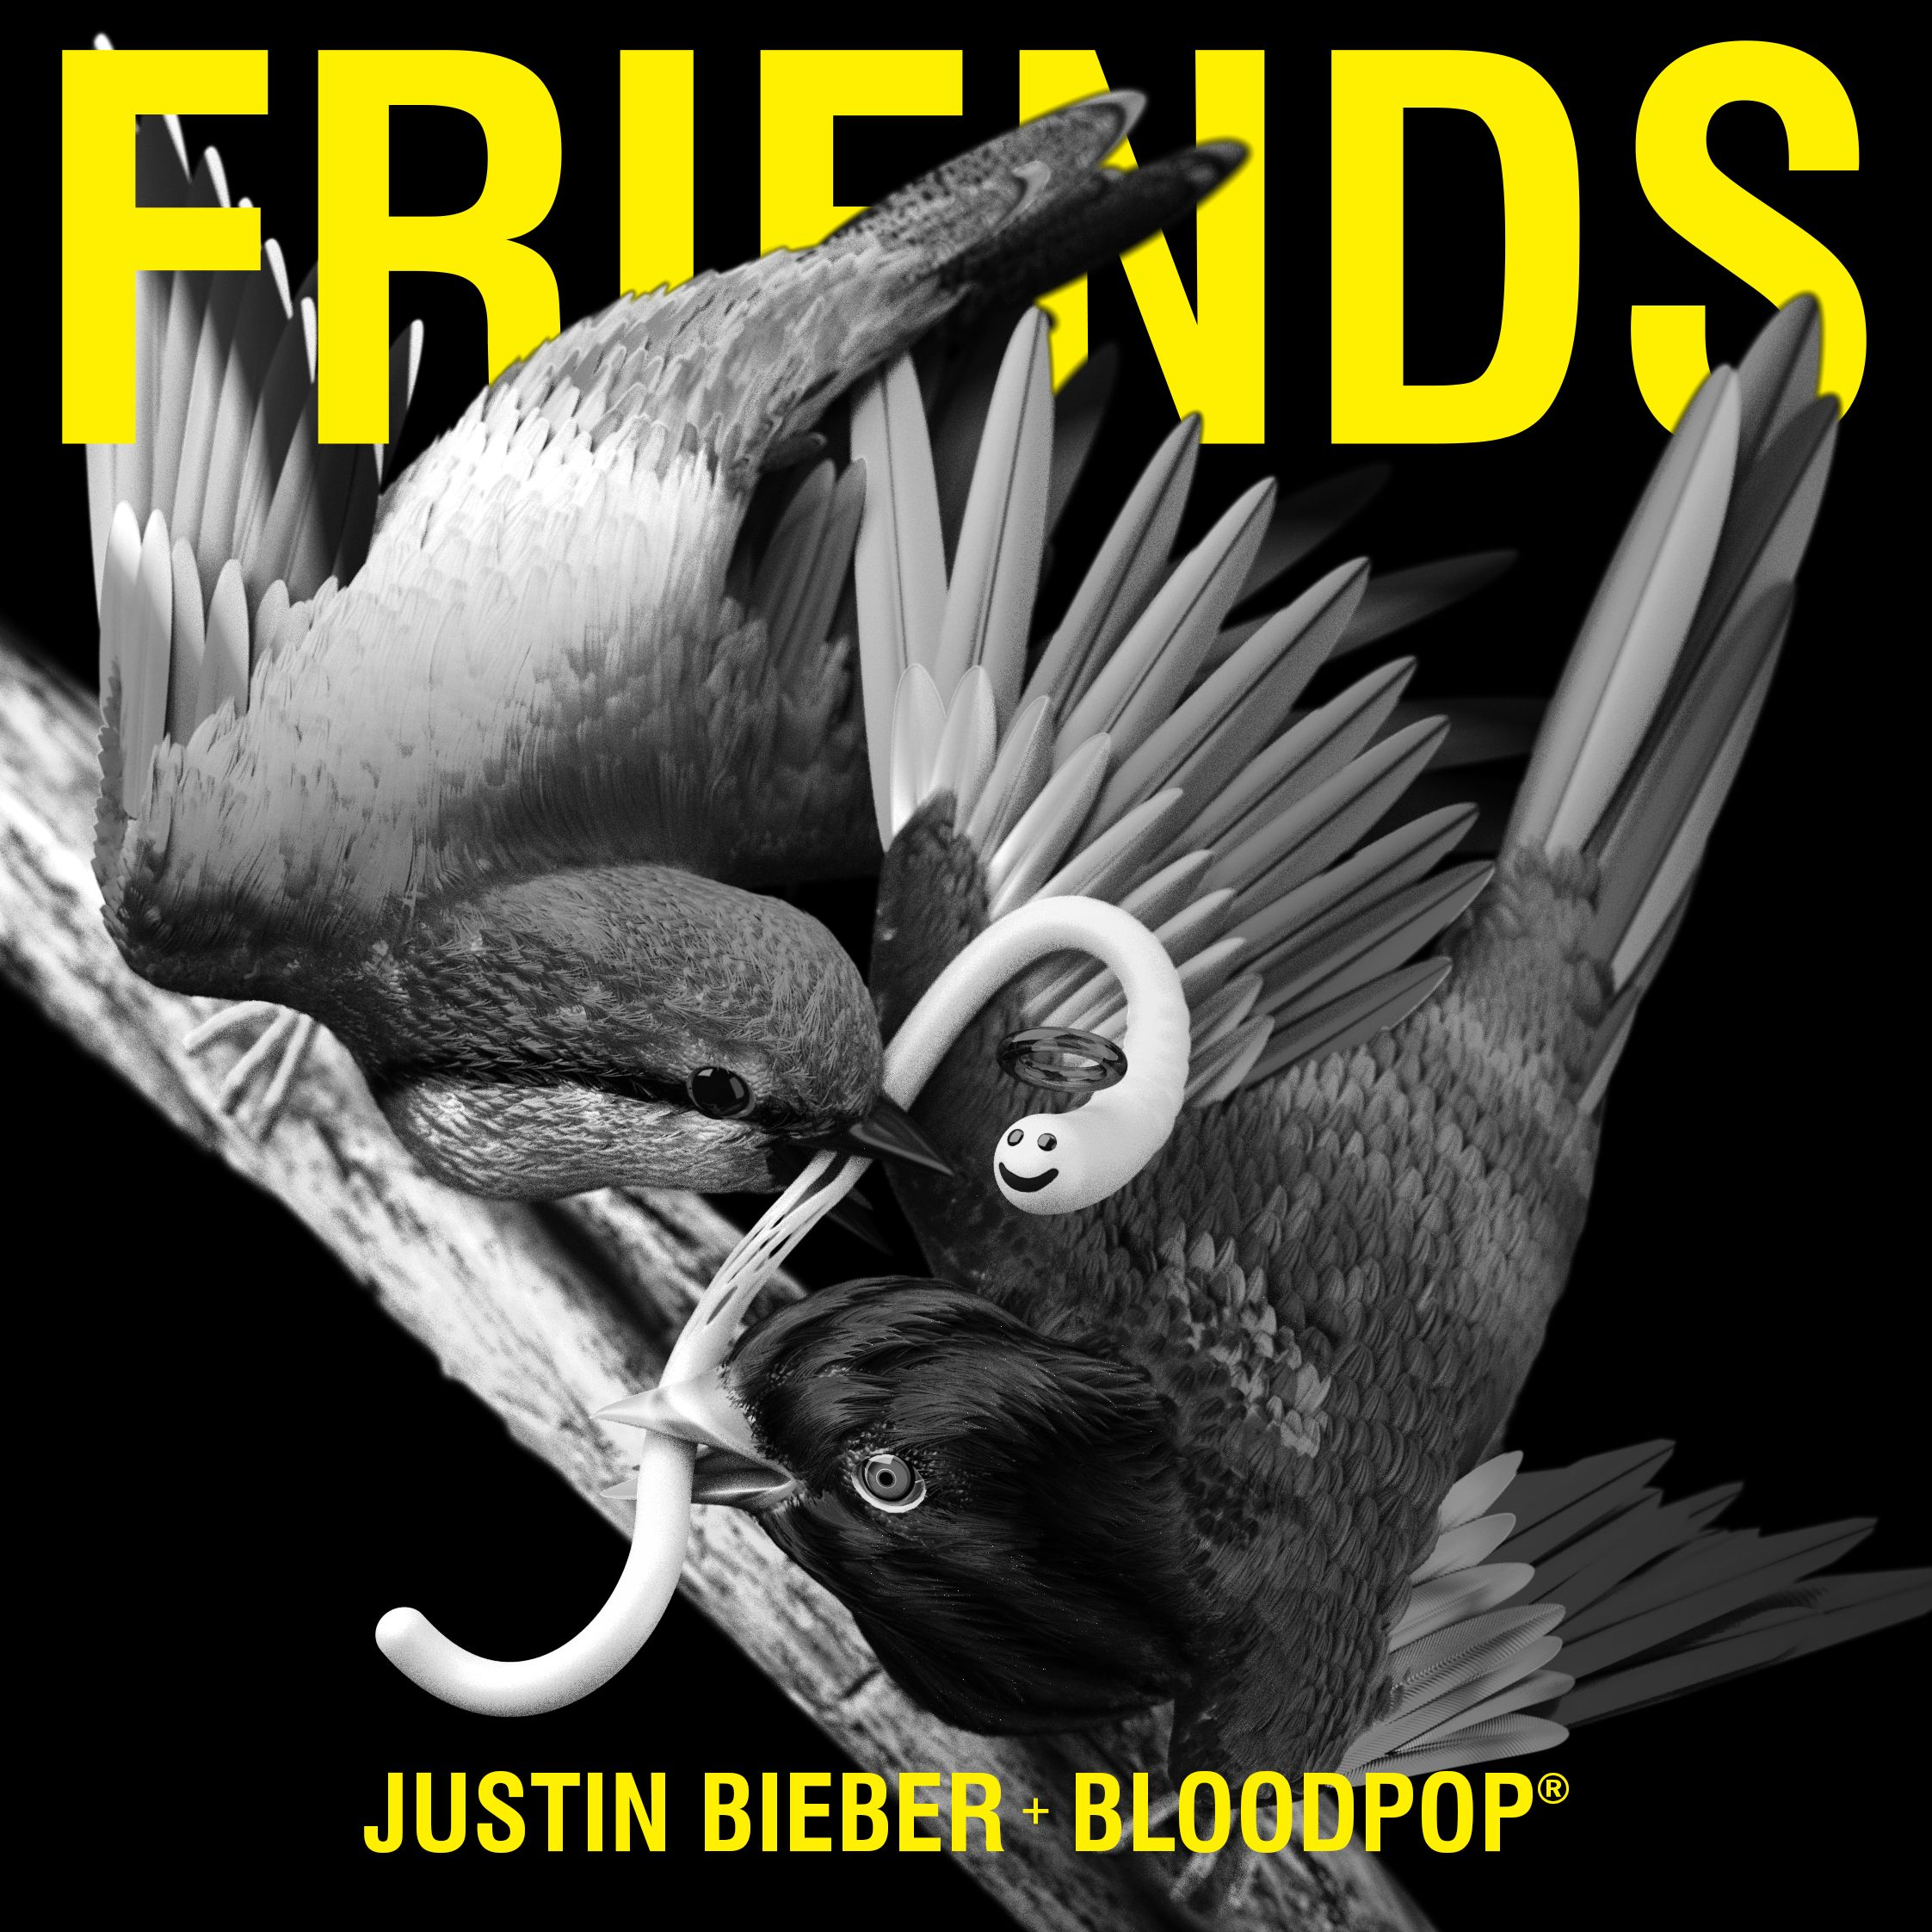 disp_img.jpgJUSTIN BIEBER + BLOODPOP® - FRIENDS